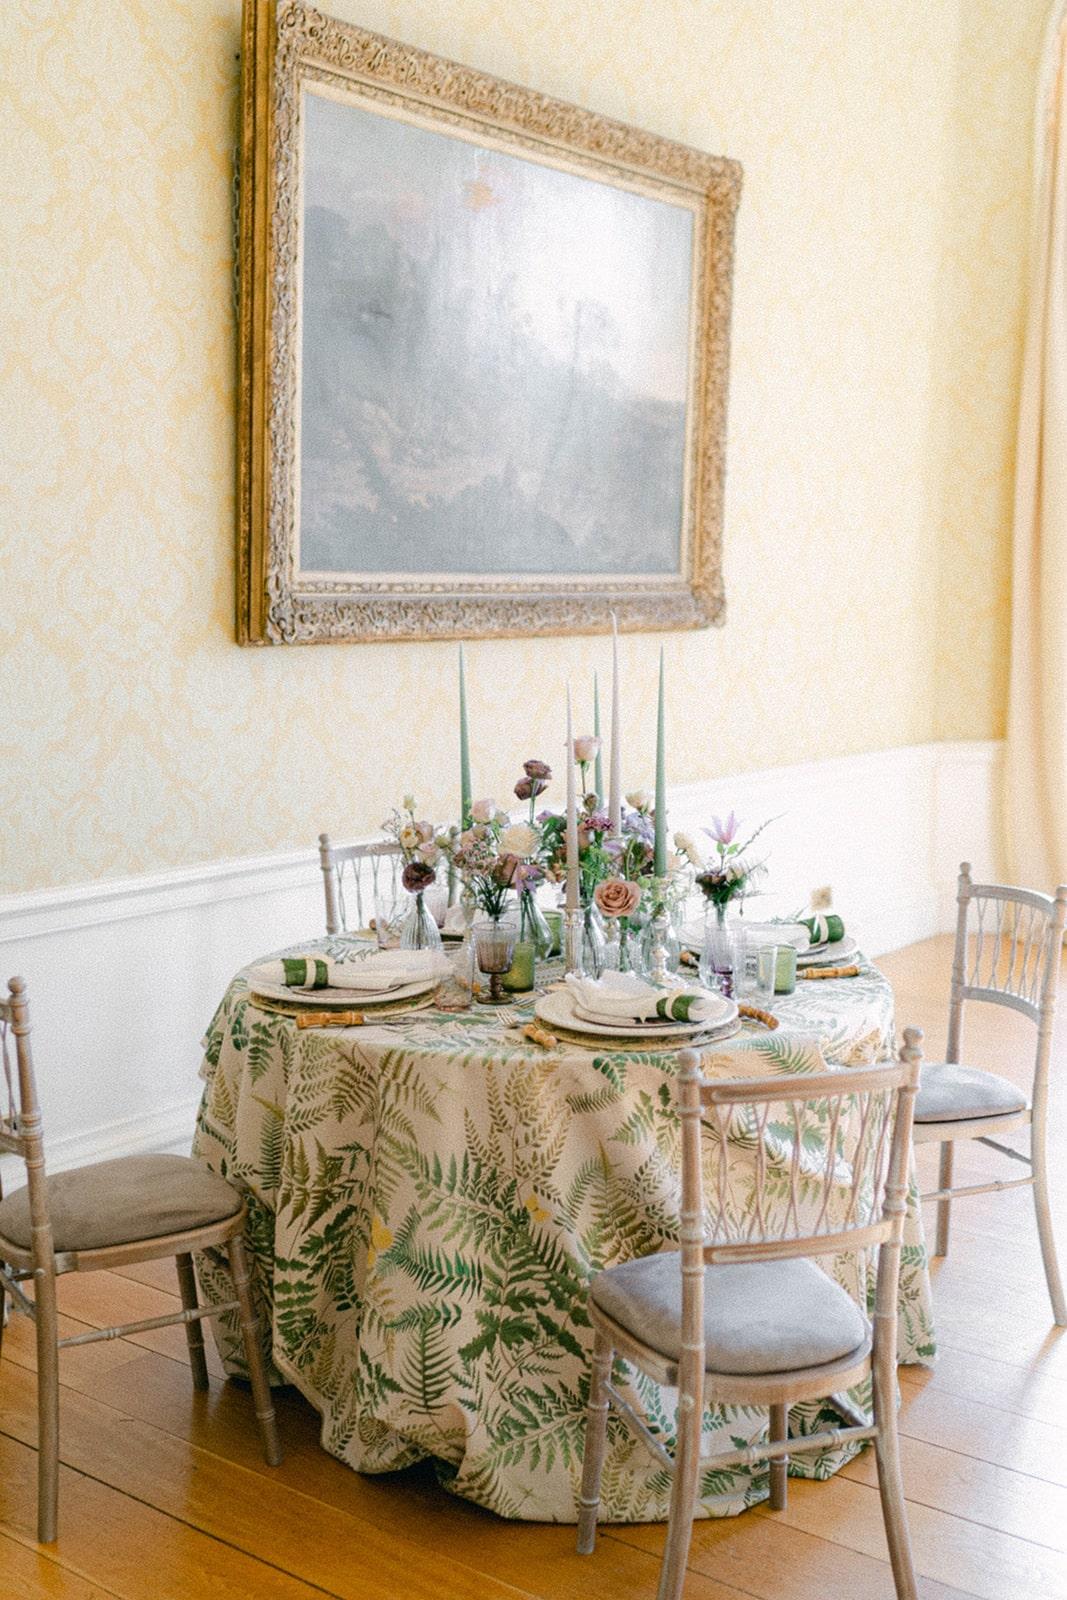 MoLi garden inspired literary wedding